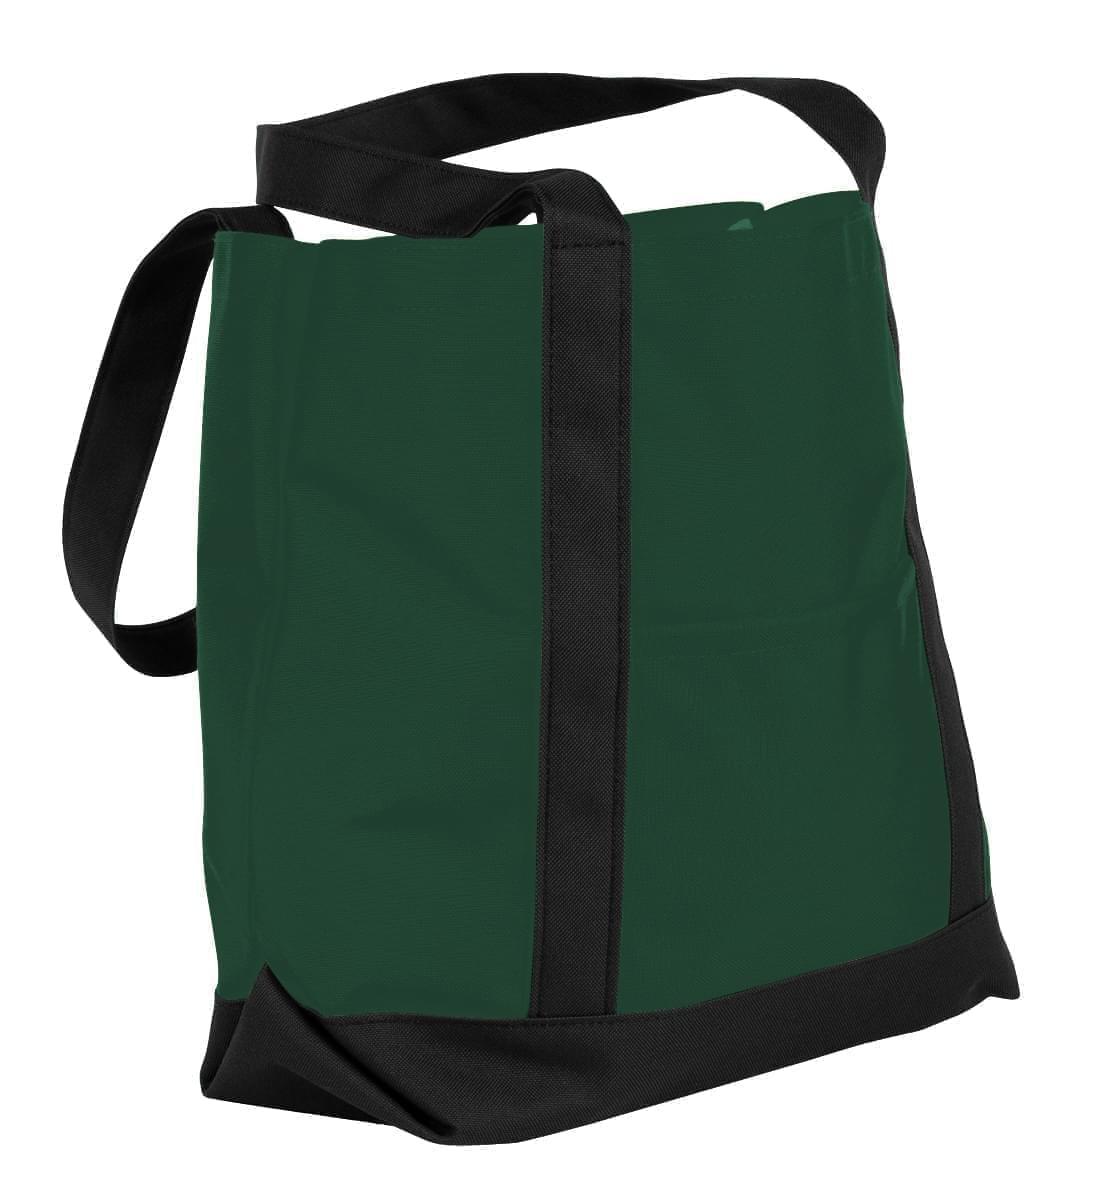 USA Made Nylon Poly Boat Tote Bags, Hunter Green-Black, XAACL1UASC